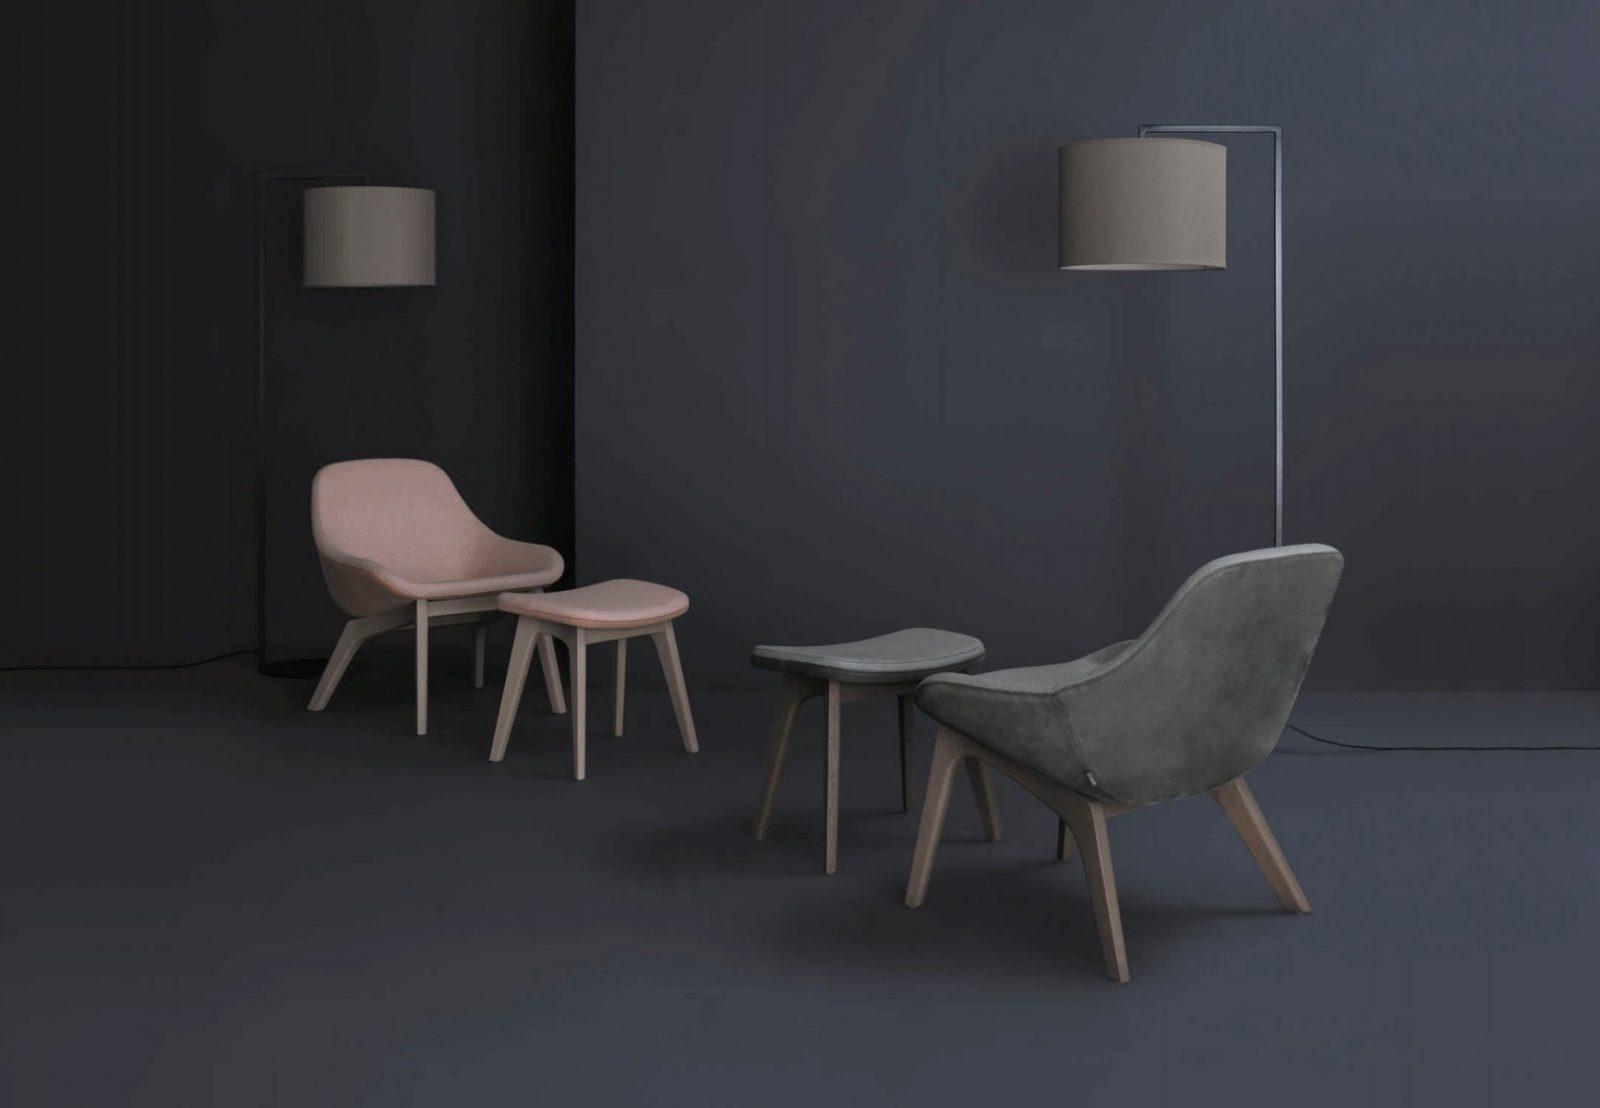 Luxus Ikea Stühle Mit Armlehne  Haus Dekoideen von Ikea Stühle Mit Armlehne Photo